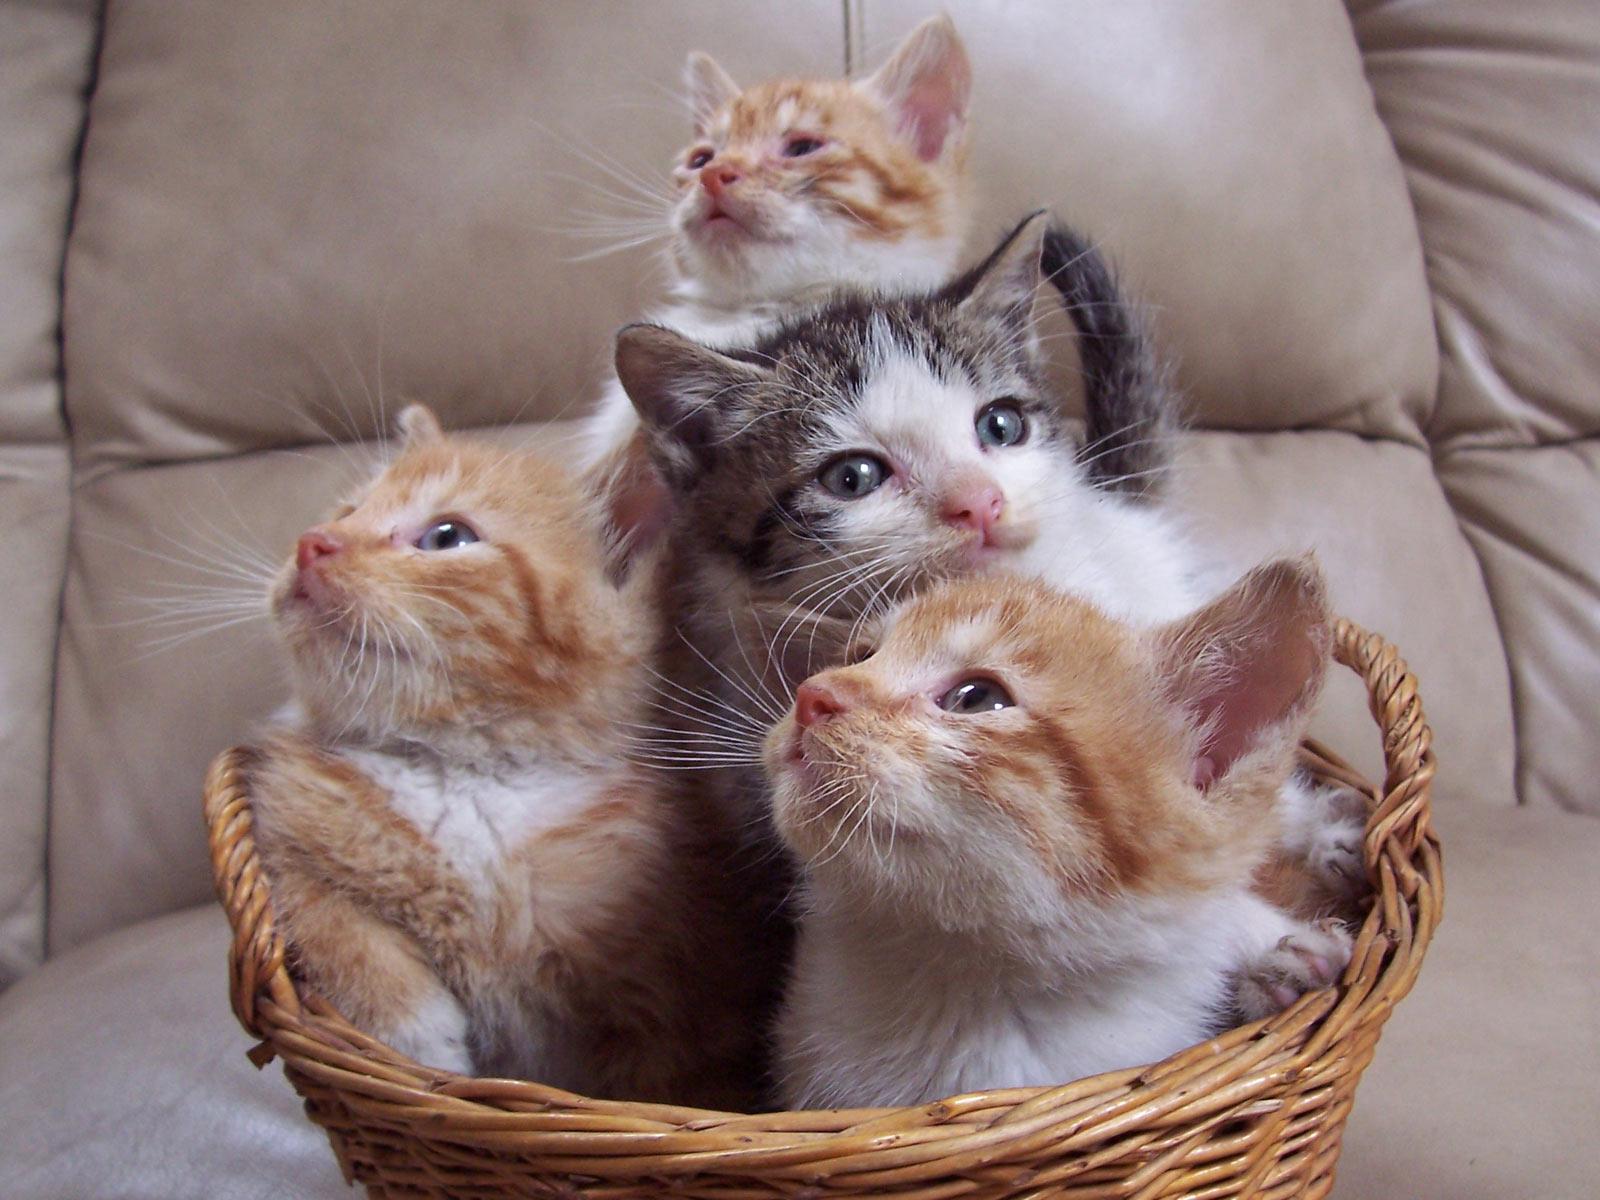 Hd wallpaper kucing - Katten Achtergronden Hd Wallpapers